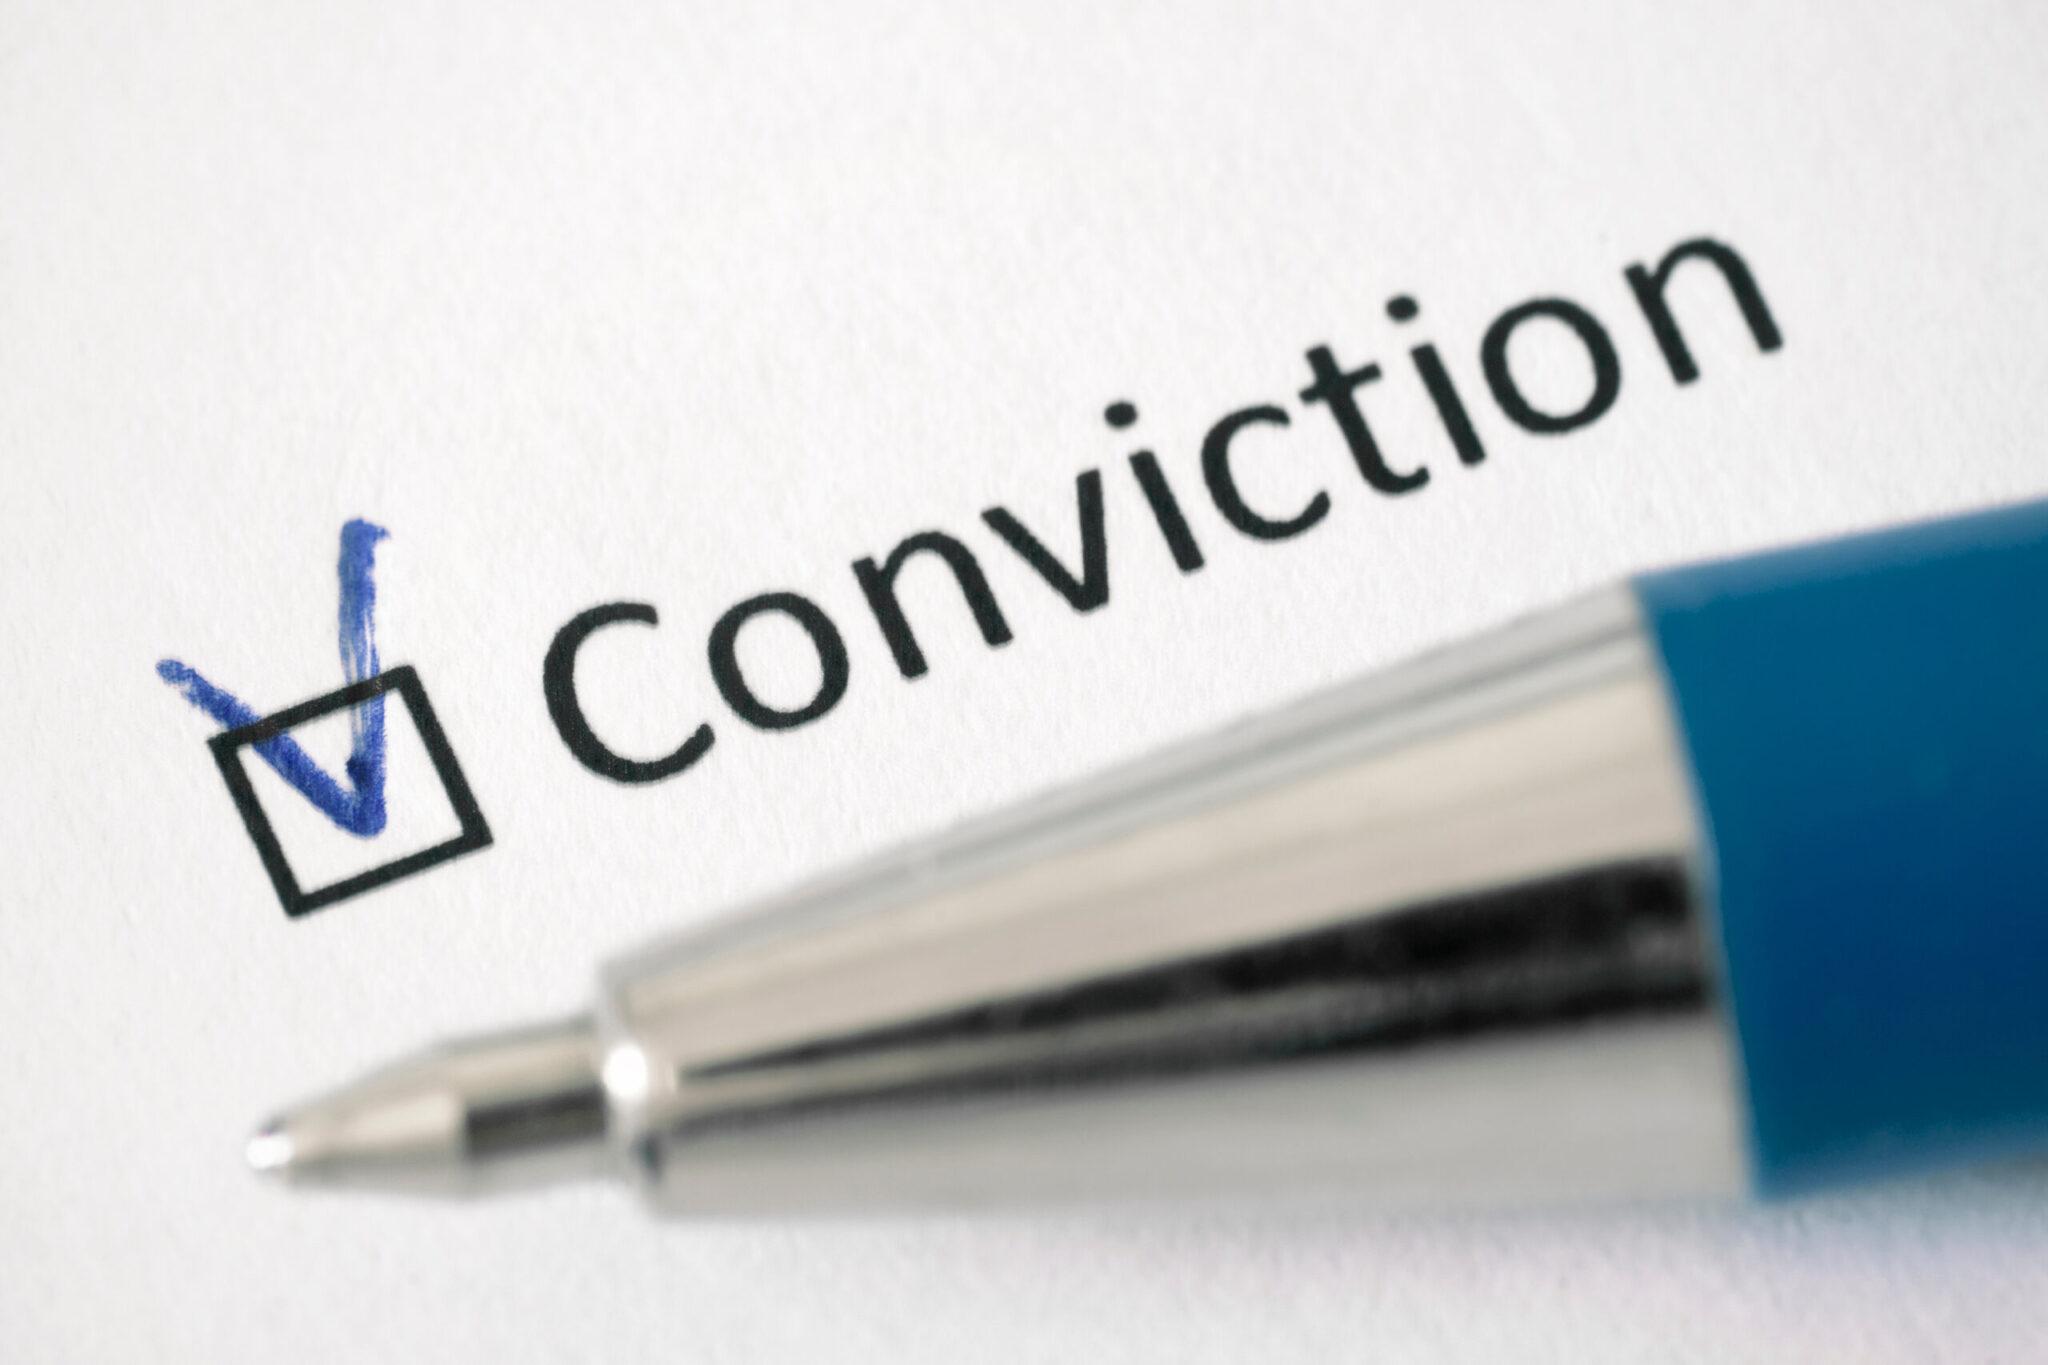 Spent Convictions Bill 2020